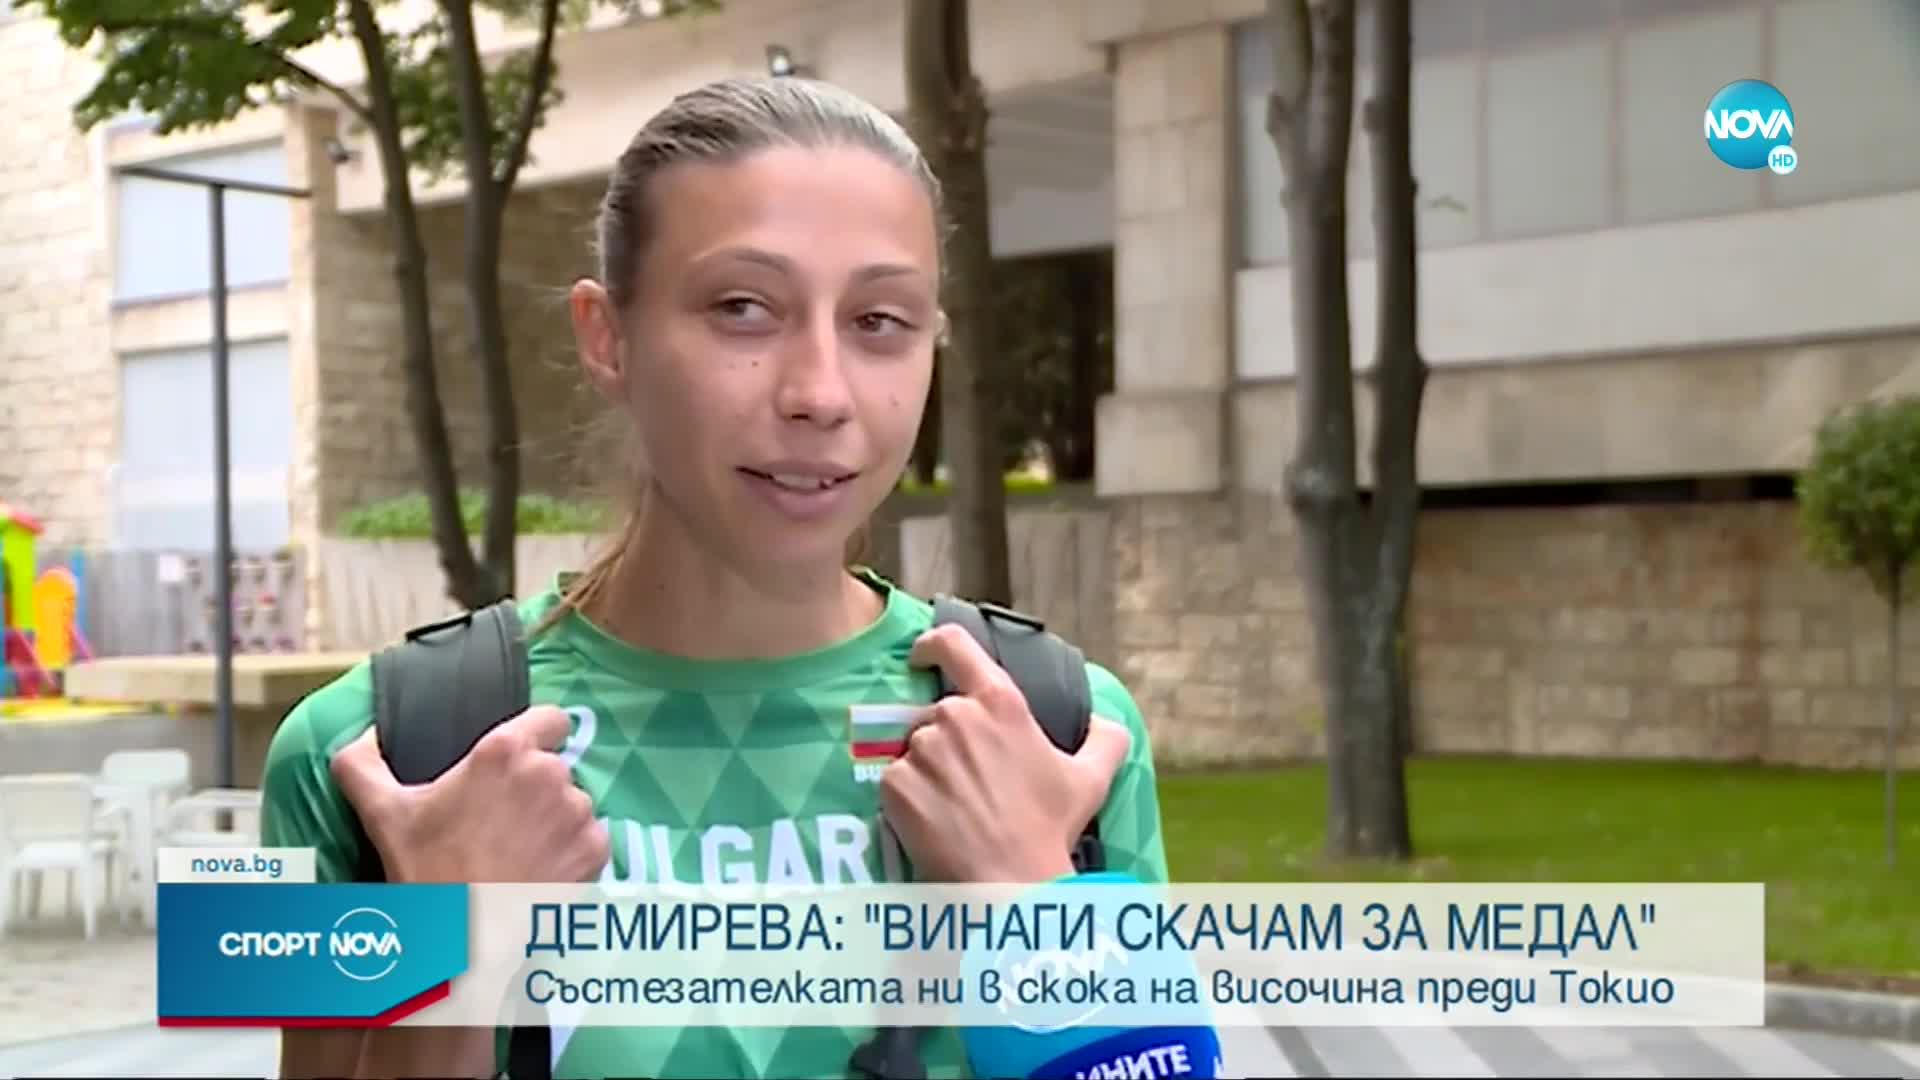 Мирела Демирева: Винаги скачам за медал